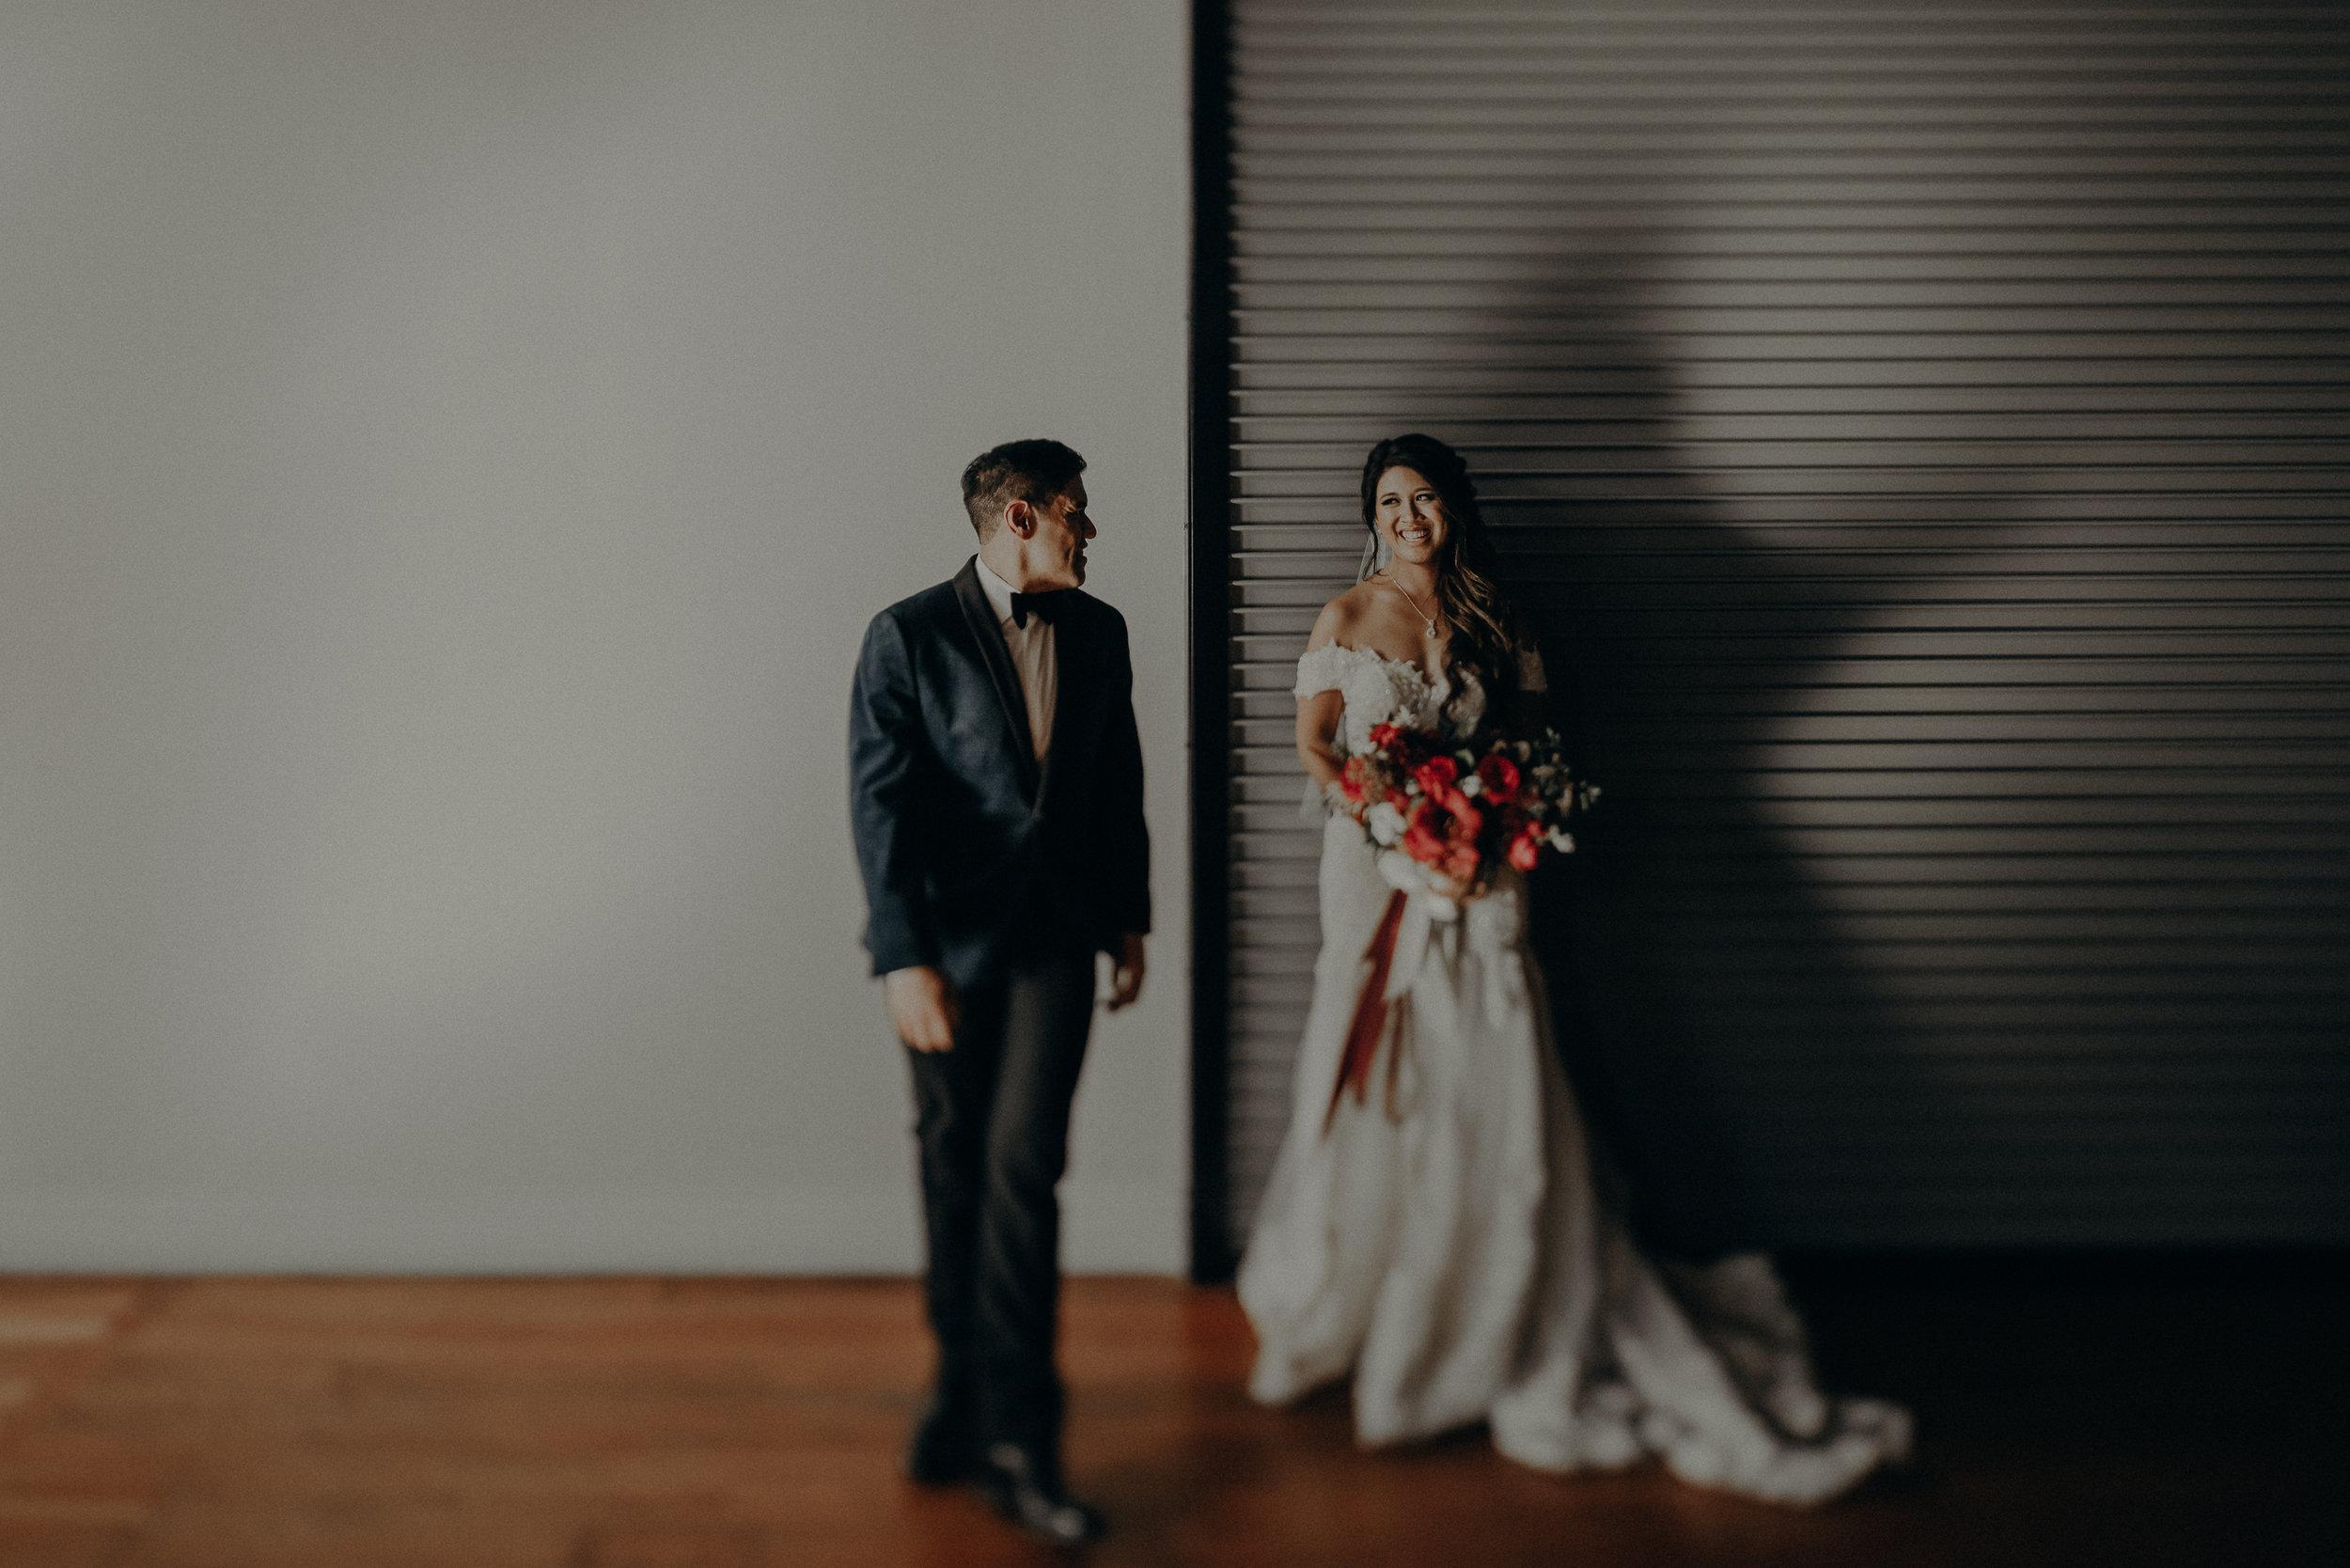 ©Isaiah + Taylor Photography - the Loft on Pine Wedding, Long Beach Wedding Photographer-139.jpg